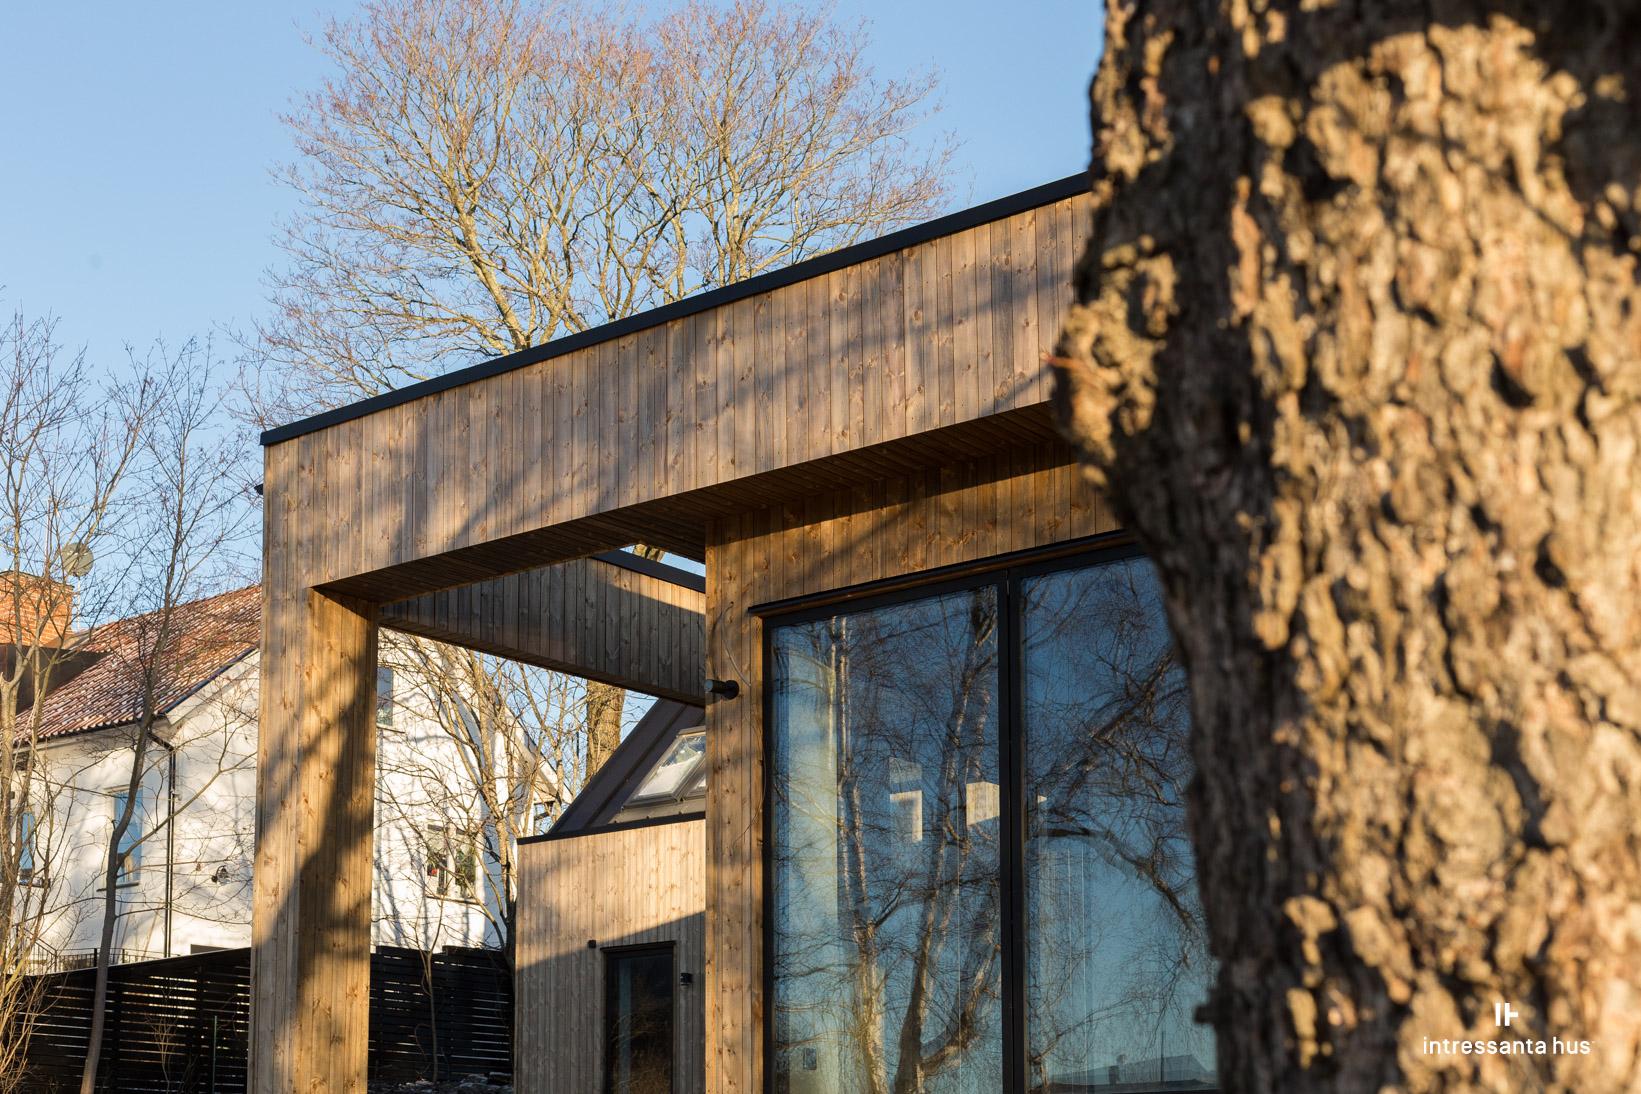 intressantahus-house1-028